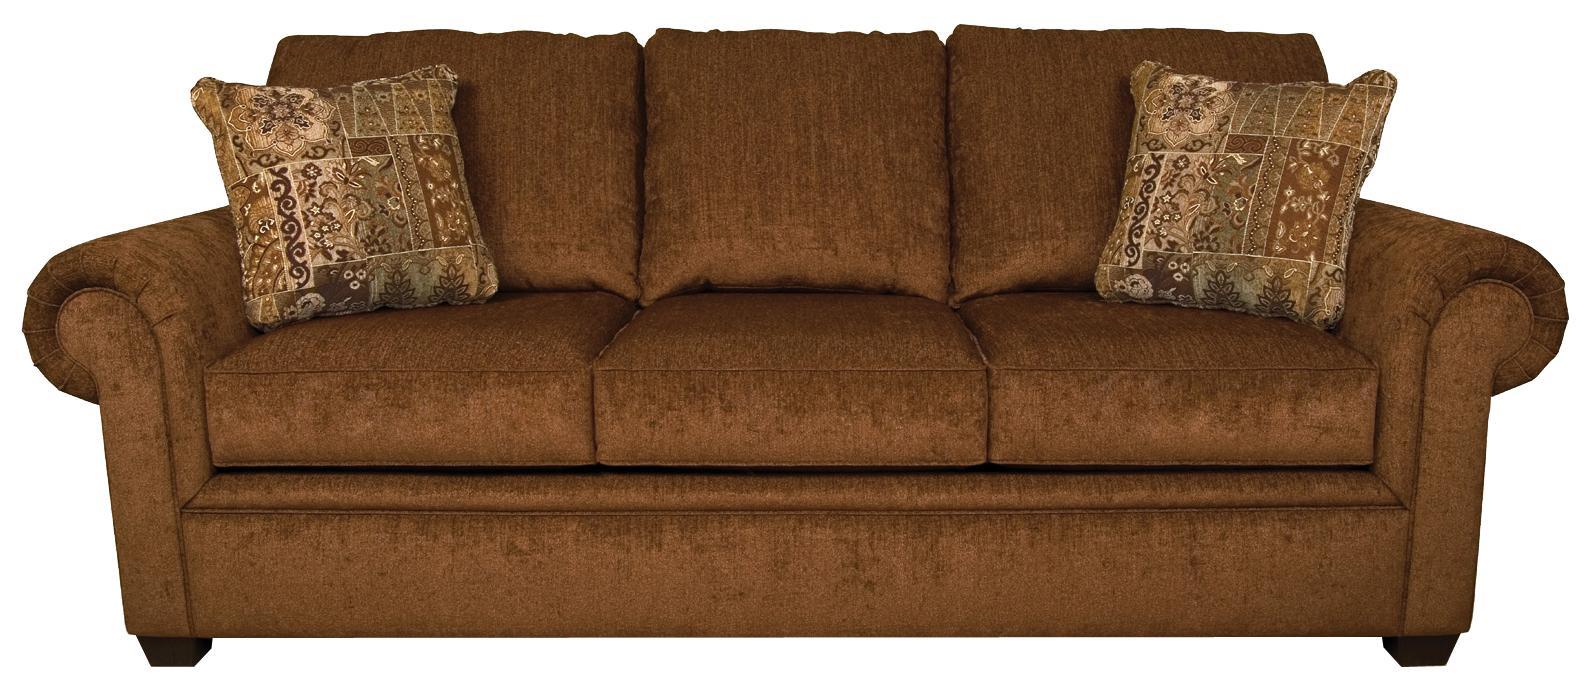 Brett Air Queen Sleeper by England at Esprit Decor Home Furnishings